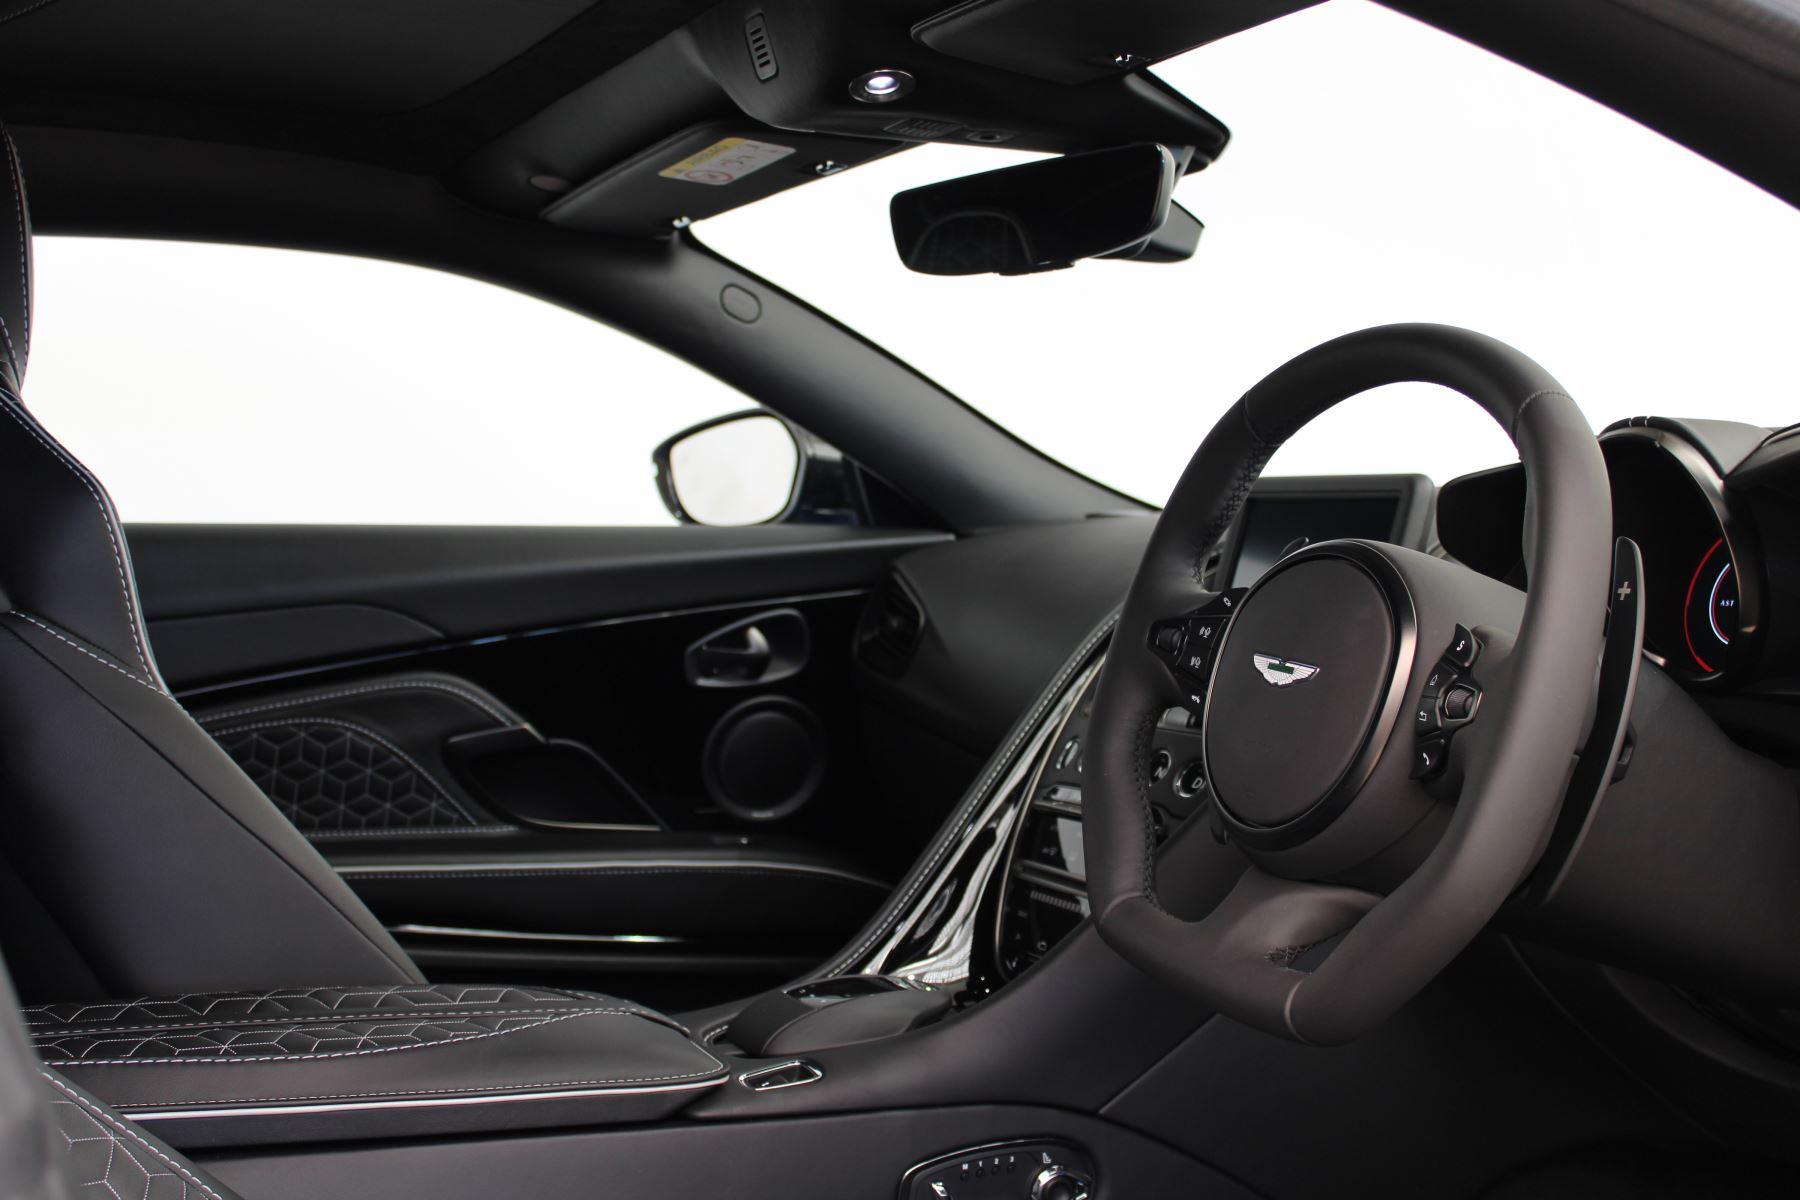 Aston Martin DBS V12 Superleggera Touchtronic Special Ceramic Blue - B&O image 23